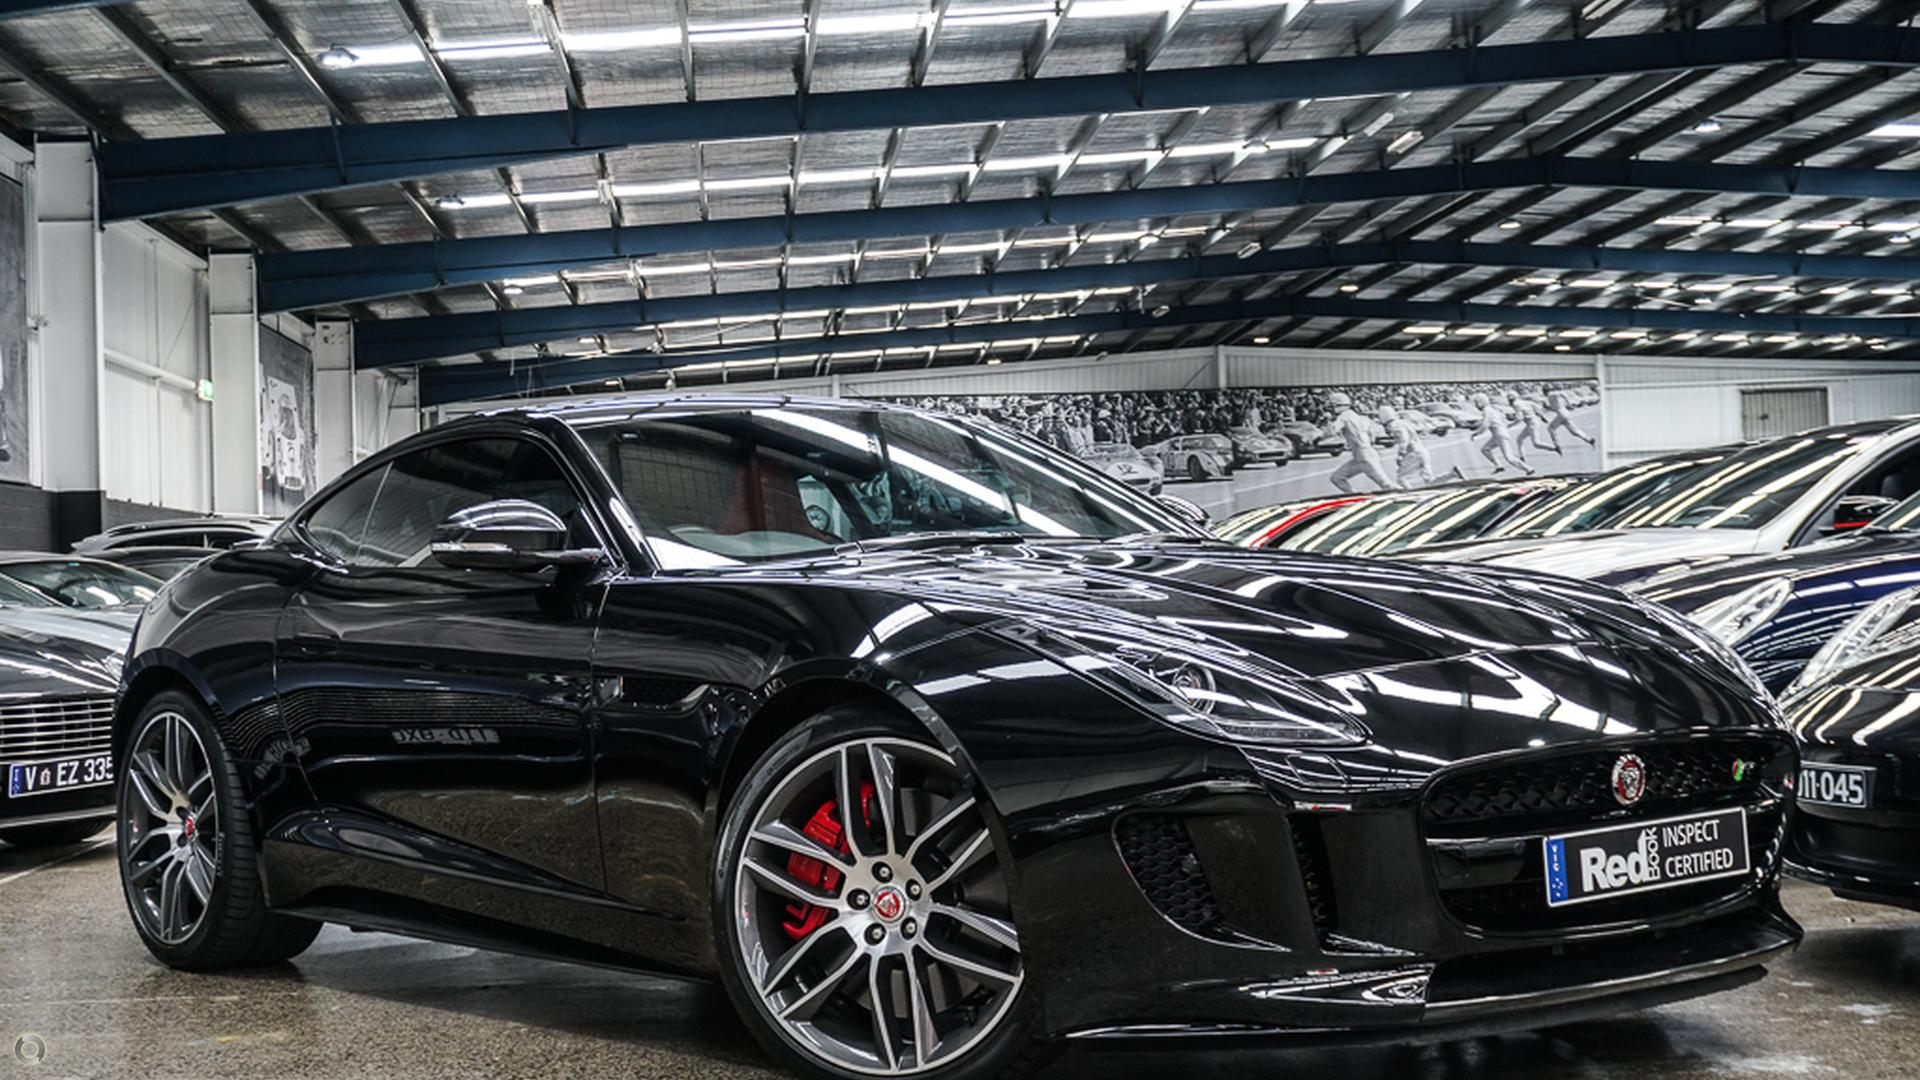 2015 Jaguar F-TYPE R X152